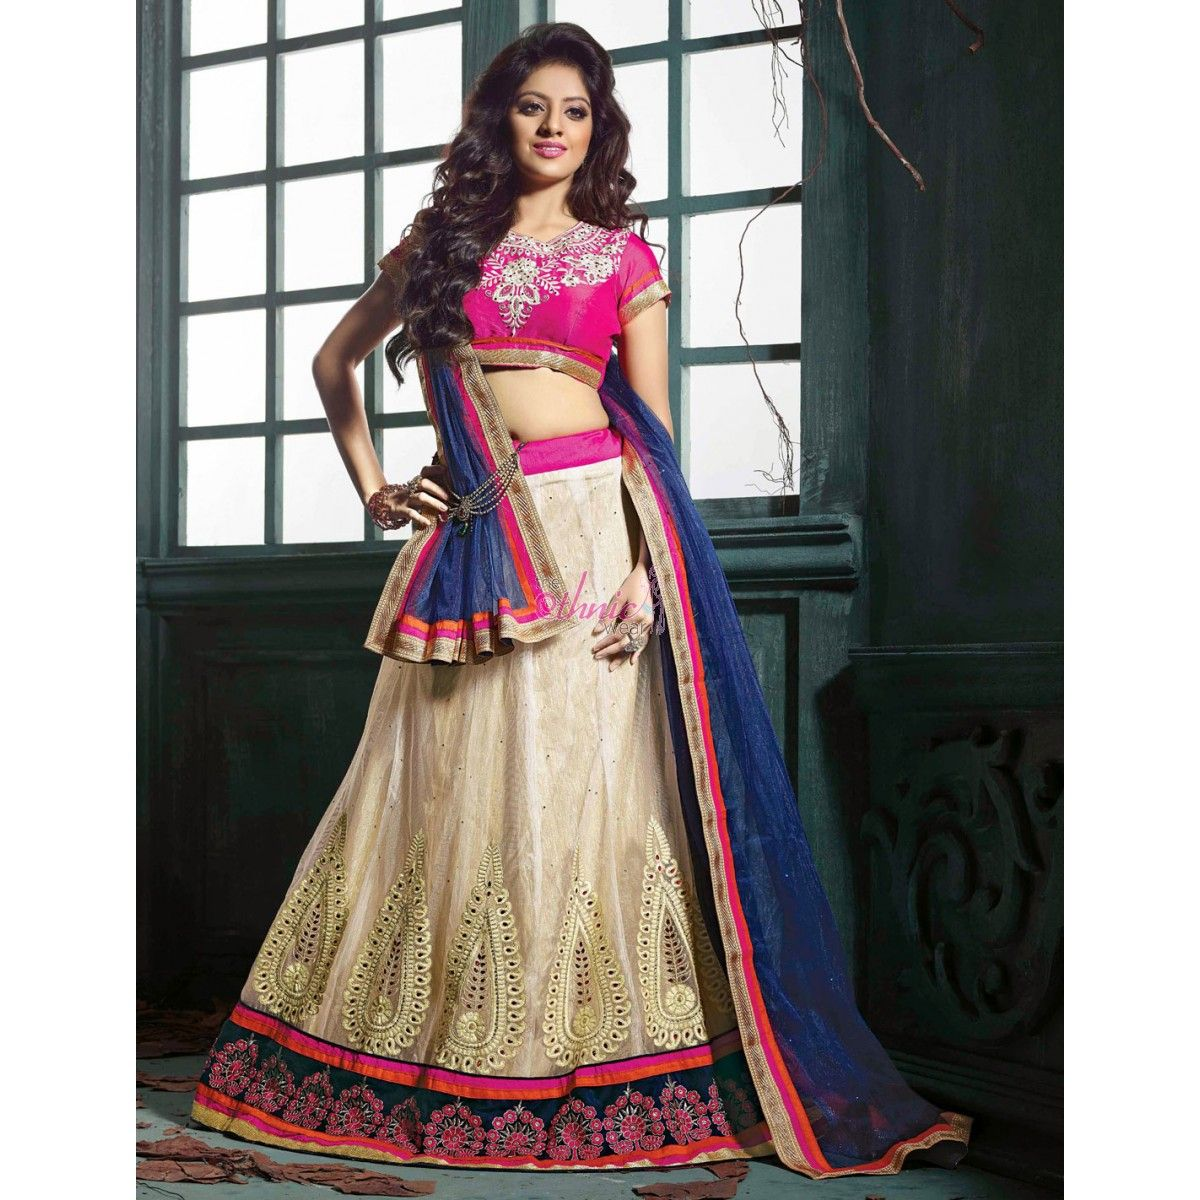 Seema Mantri Pink Net #Lehenga #Choli #Clothing #Fashion #Clothing #LehengaCholi